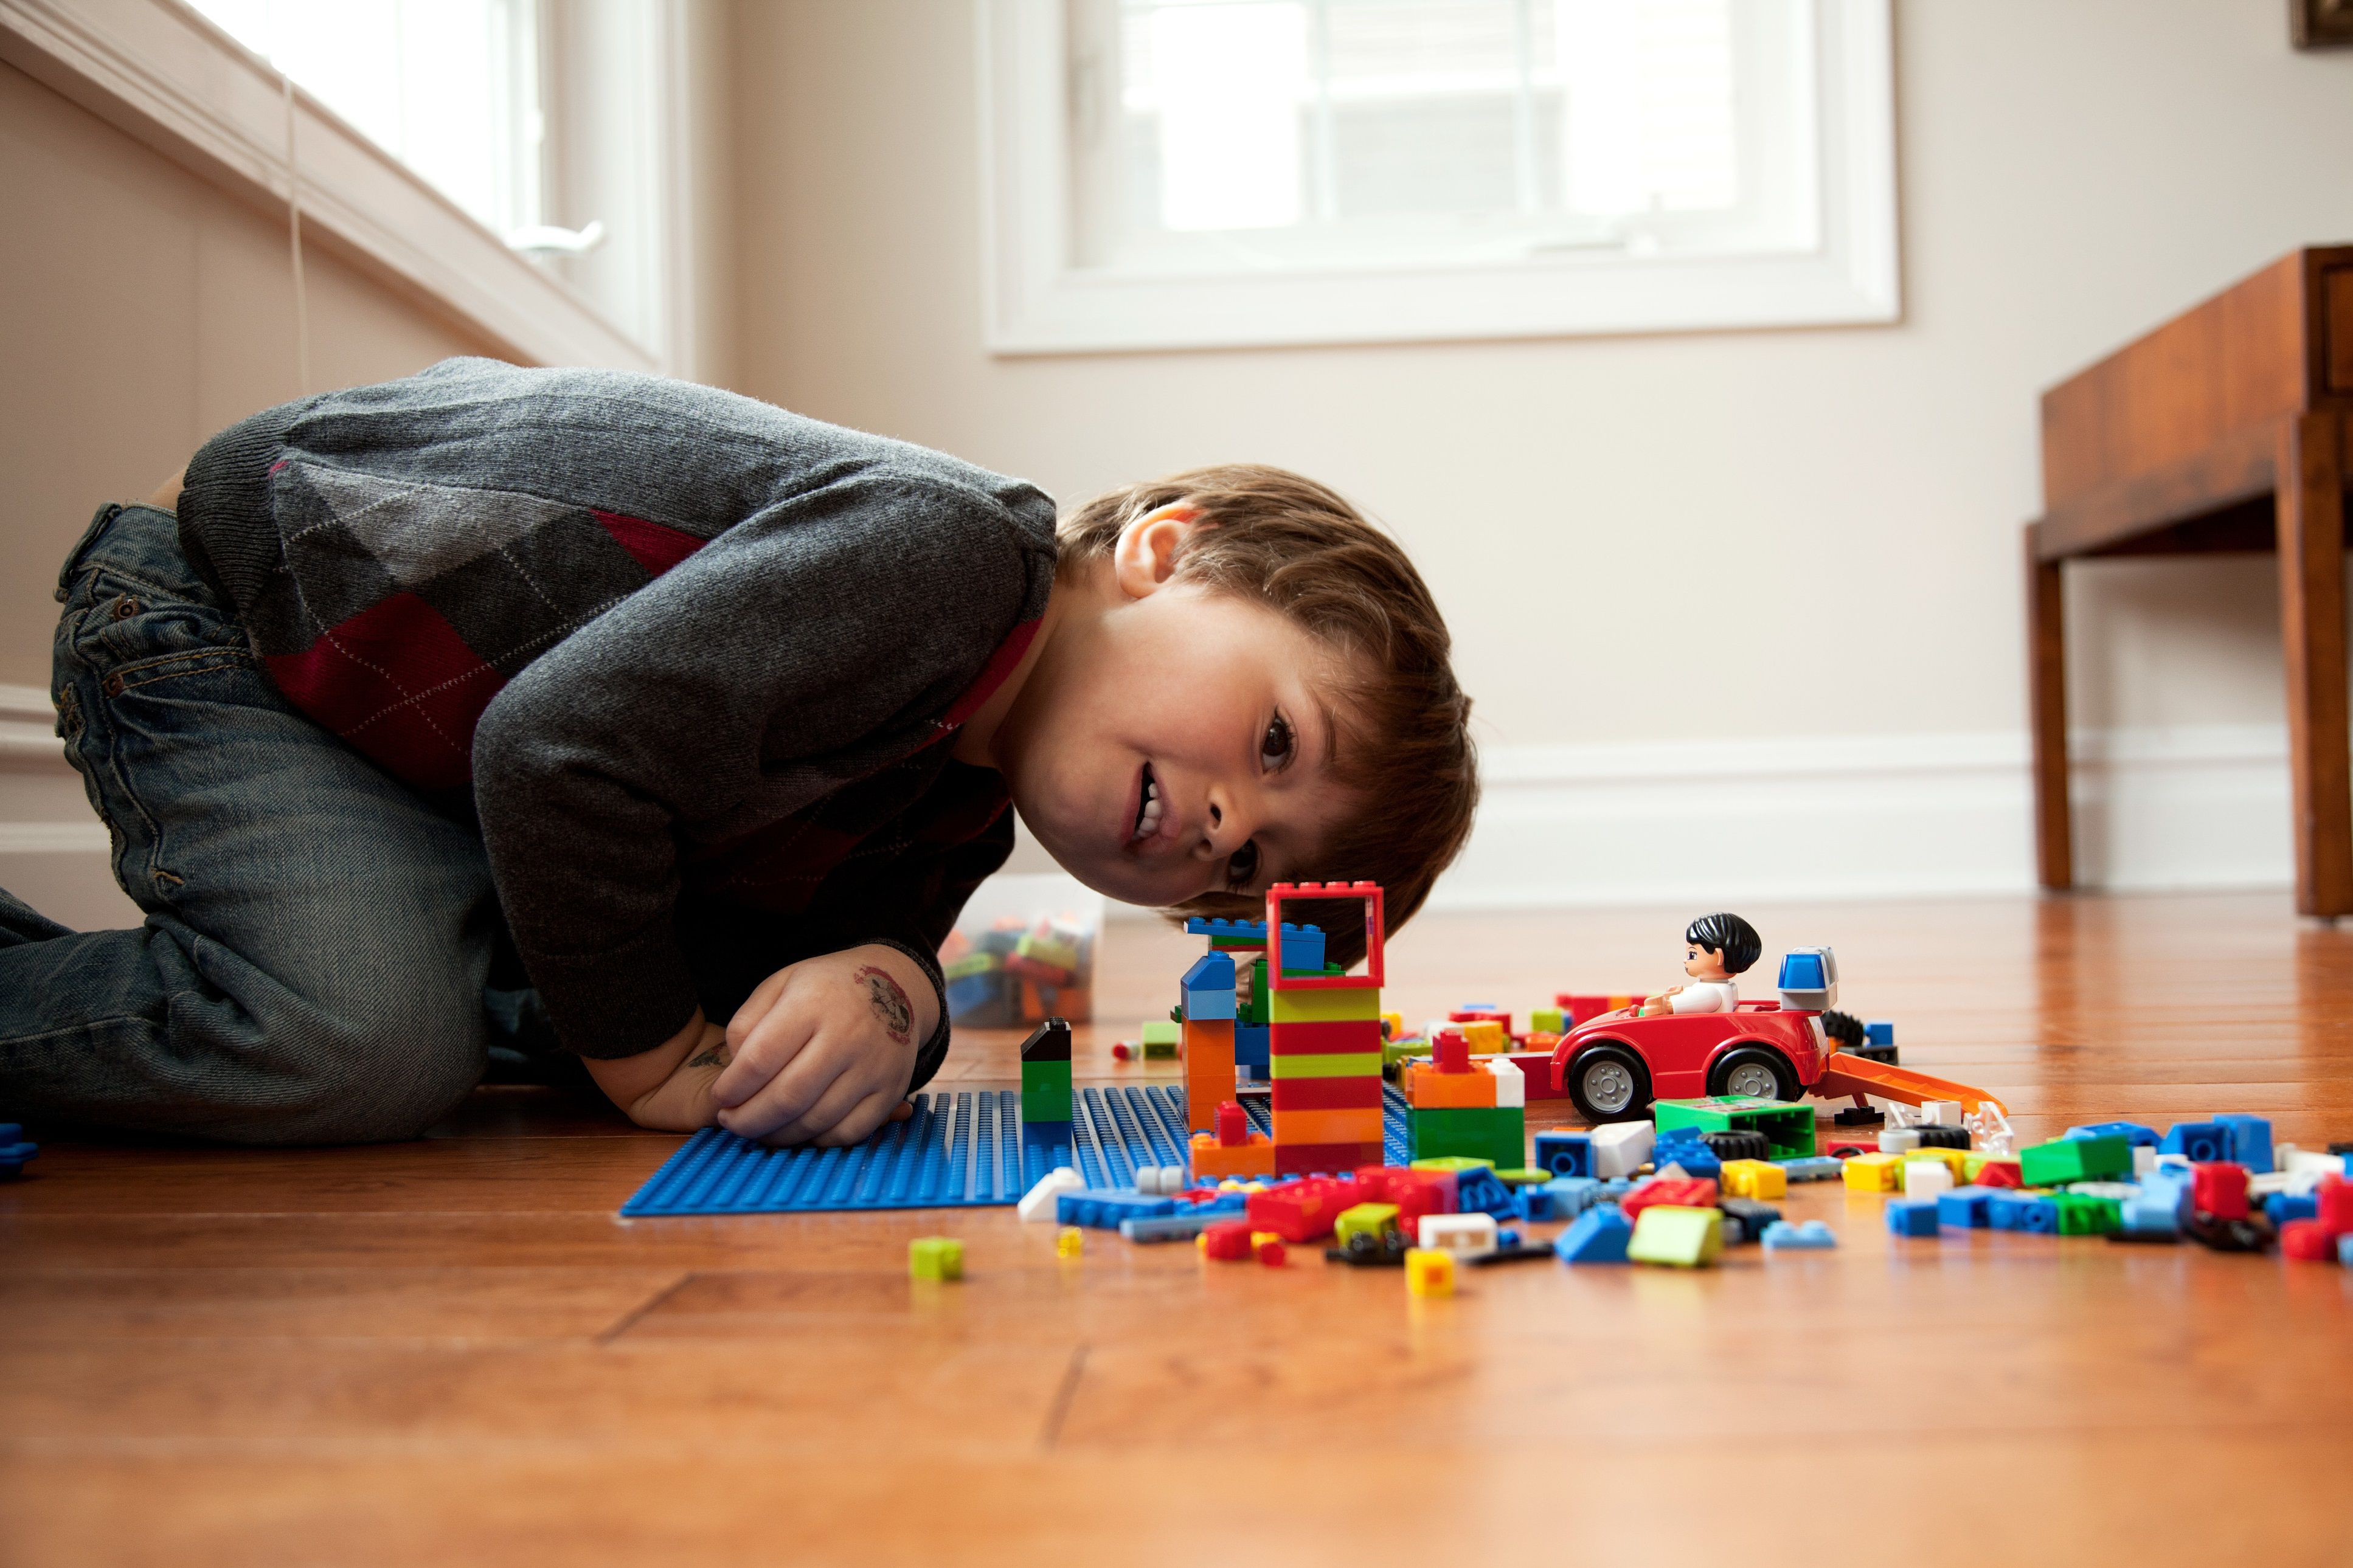 pretend play - boy on floor with Lego